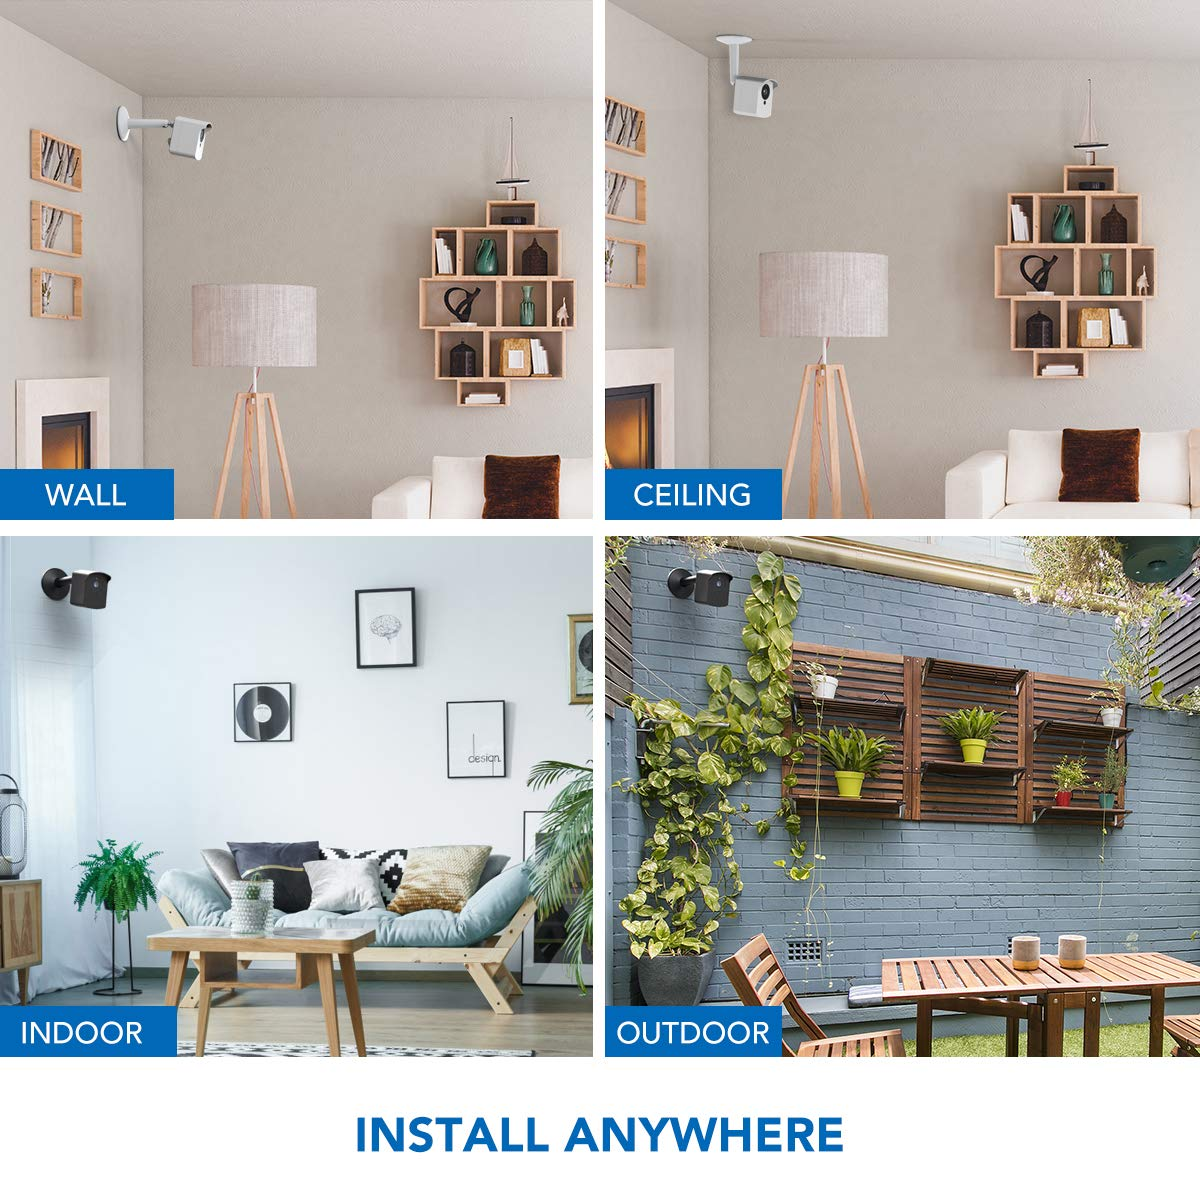 Arlo Pro 2 KIWI design Adjustable Aluminium Alloy Ceiling//Wall Mount for Oculus Sensor 2 Pack, Black Oculus Rift Sensor Mount Arlo Arlo Ultra /& Other Camera Models with 1//4 Inch Thread Arlo Pro